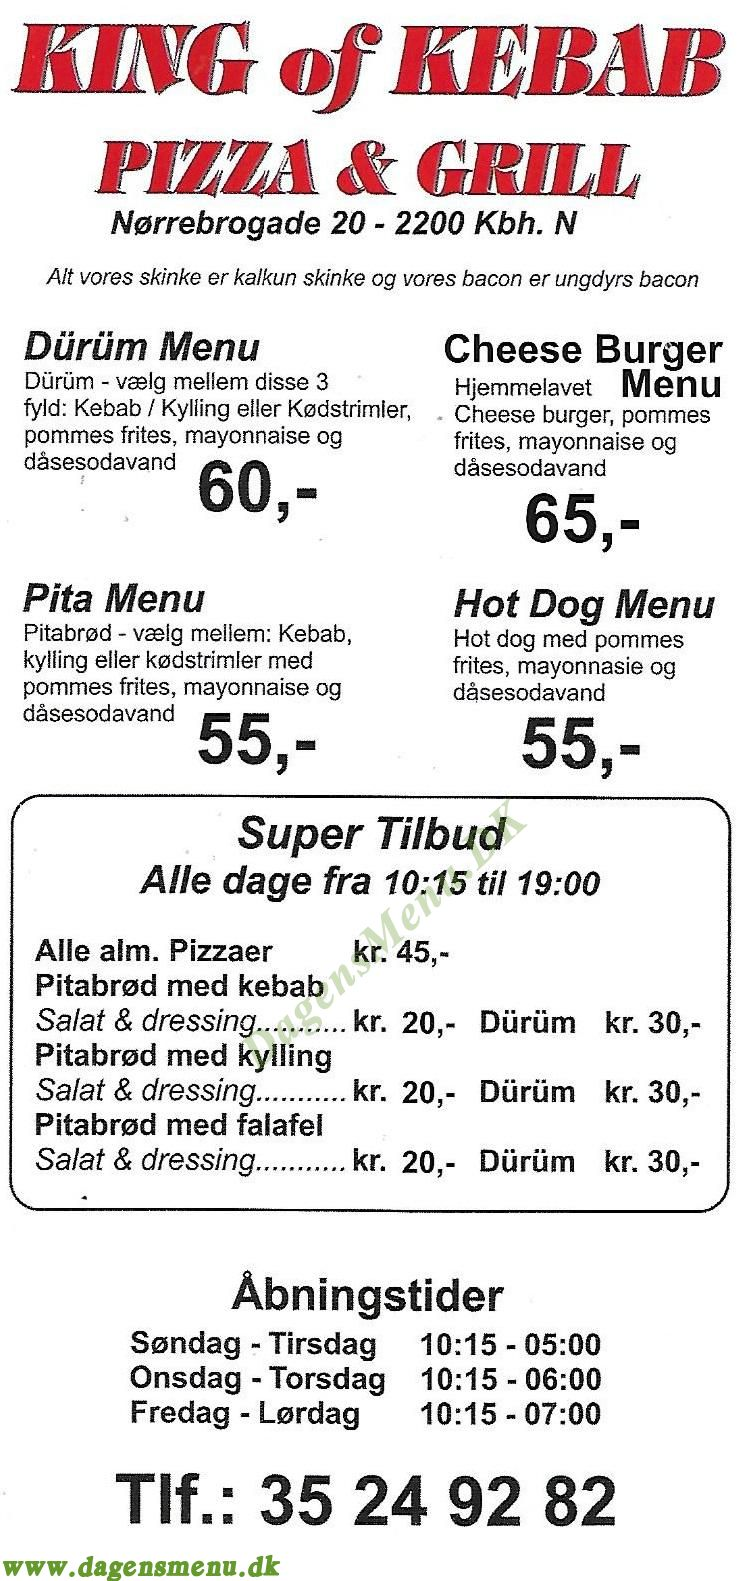 King Of Kebab Pizza & Grill - Menukort